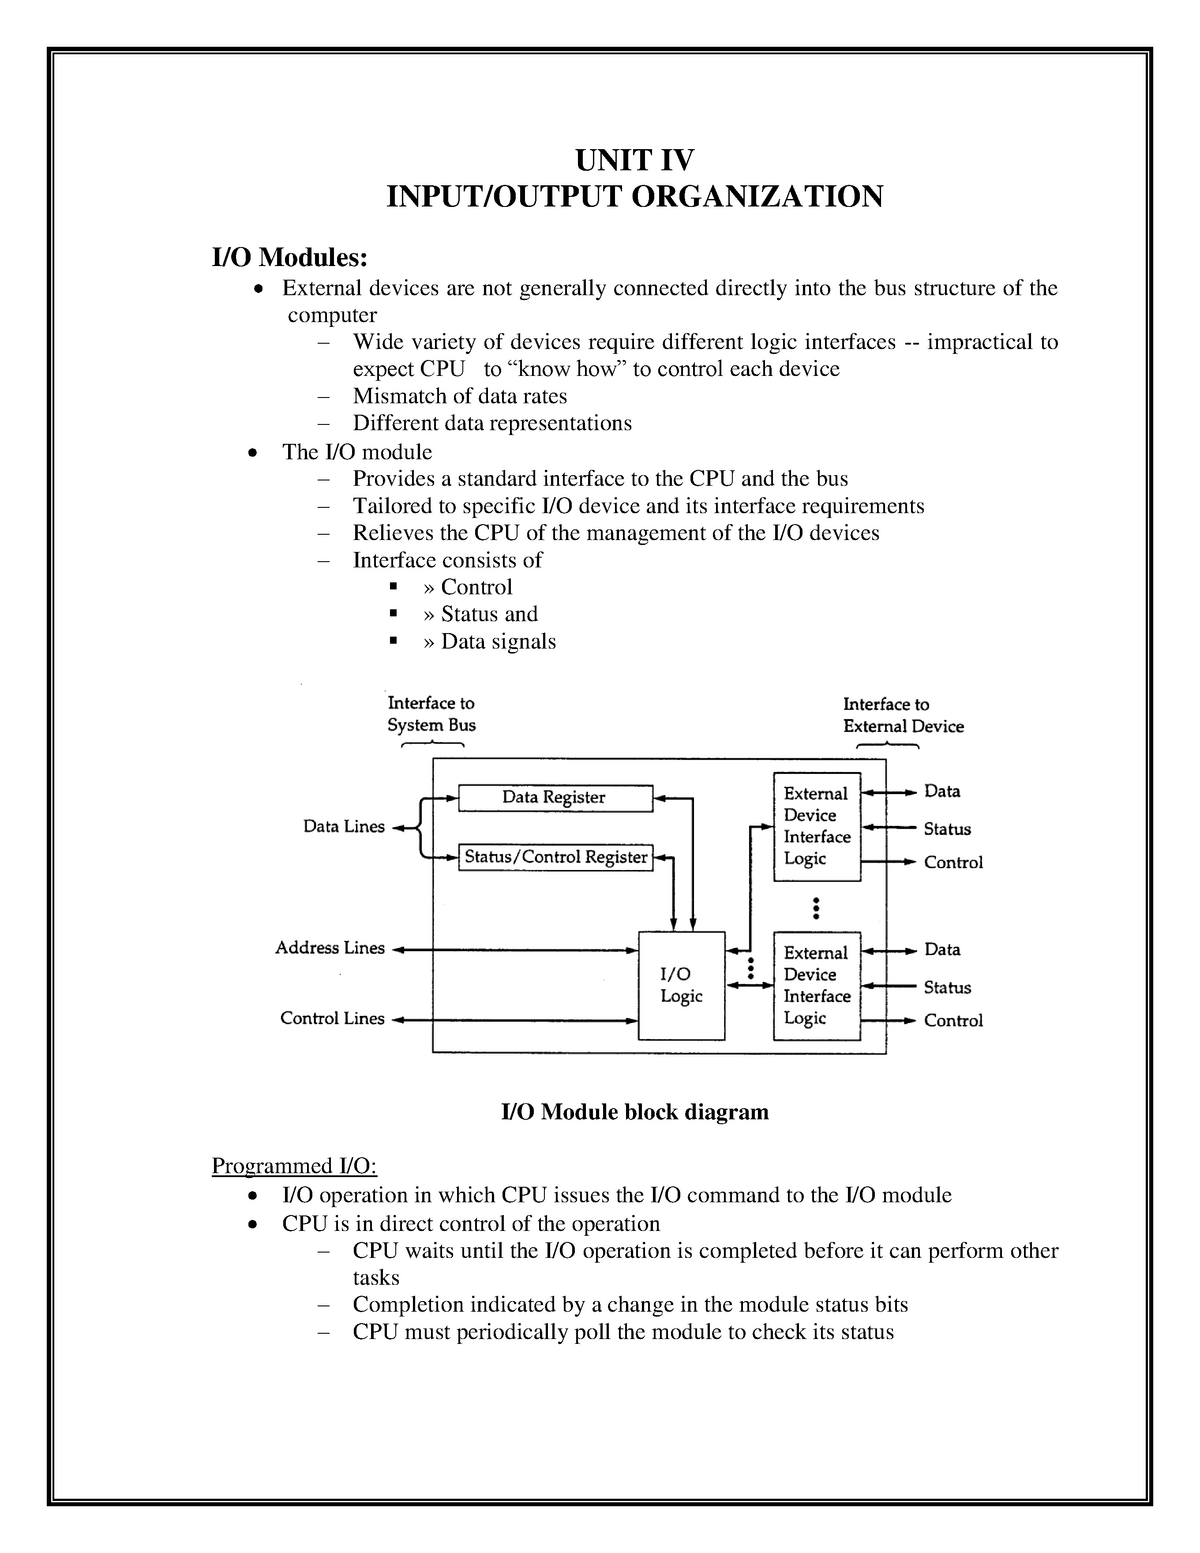 Unit 4 - Input/Output organization : Input interface Data